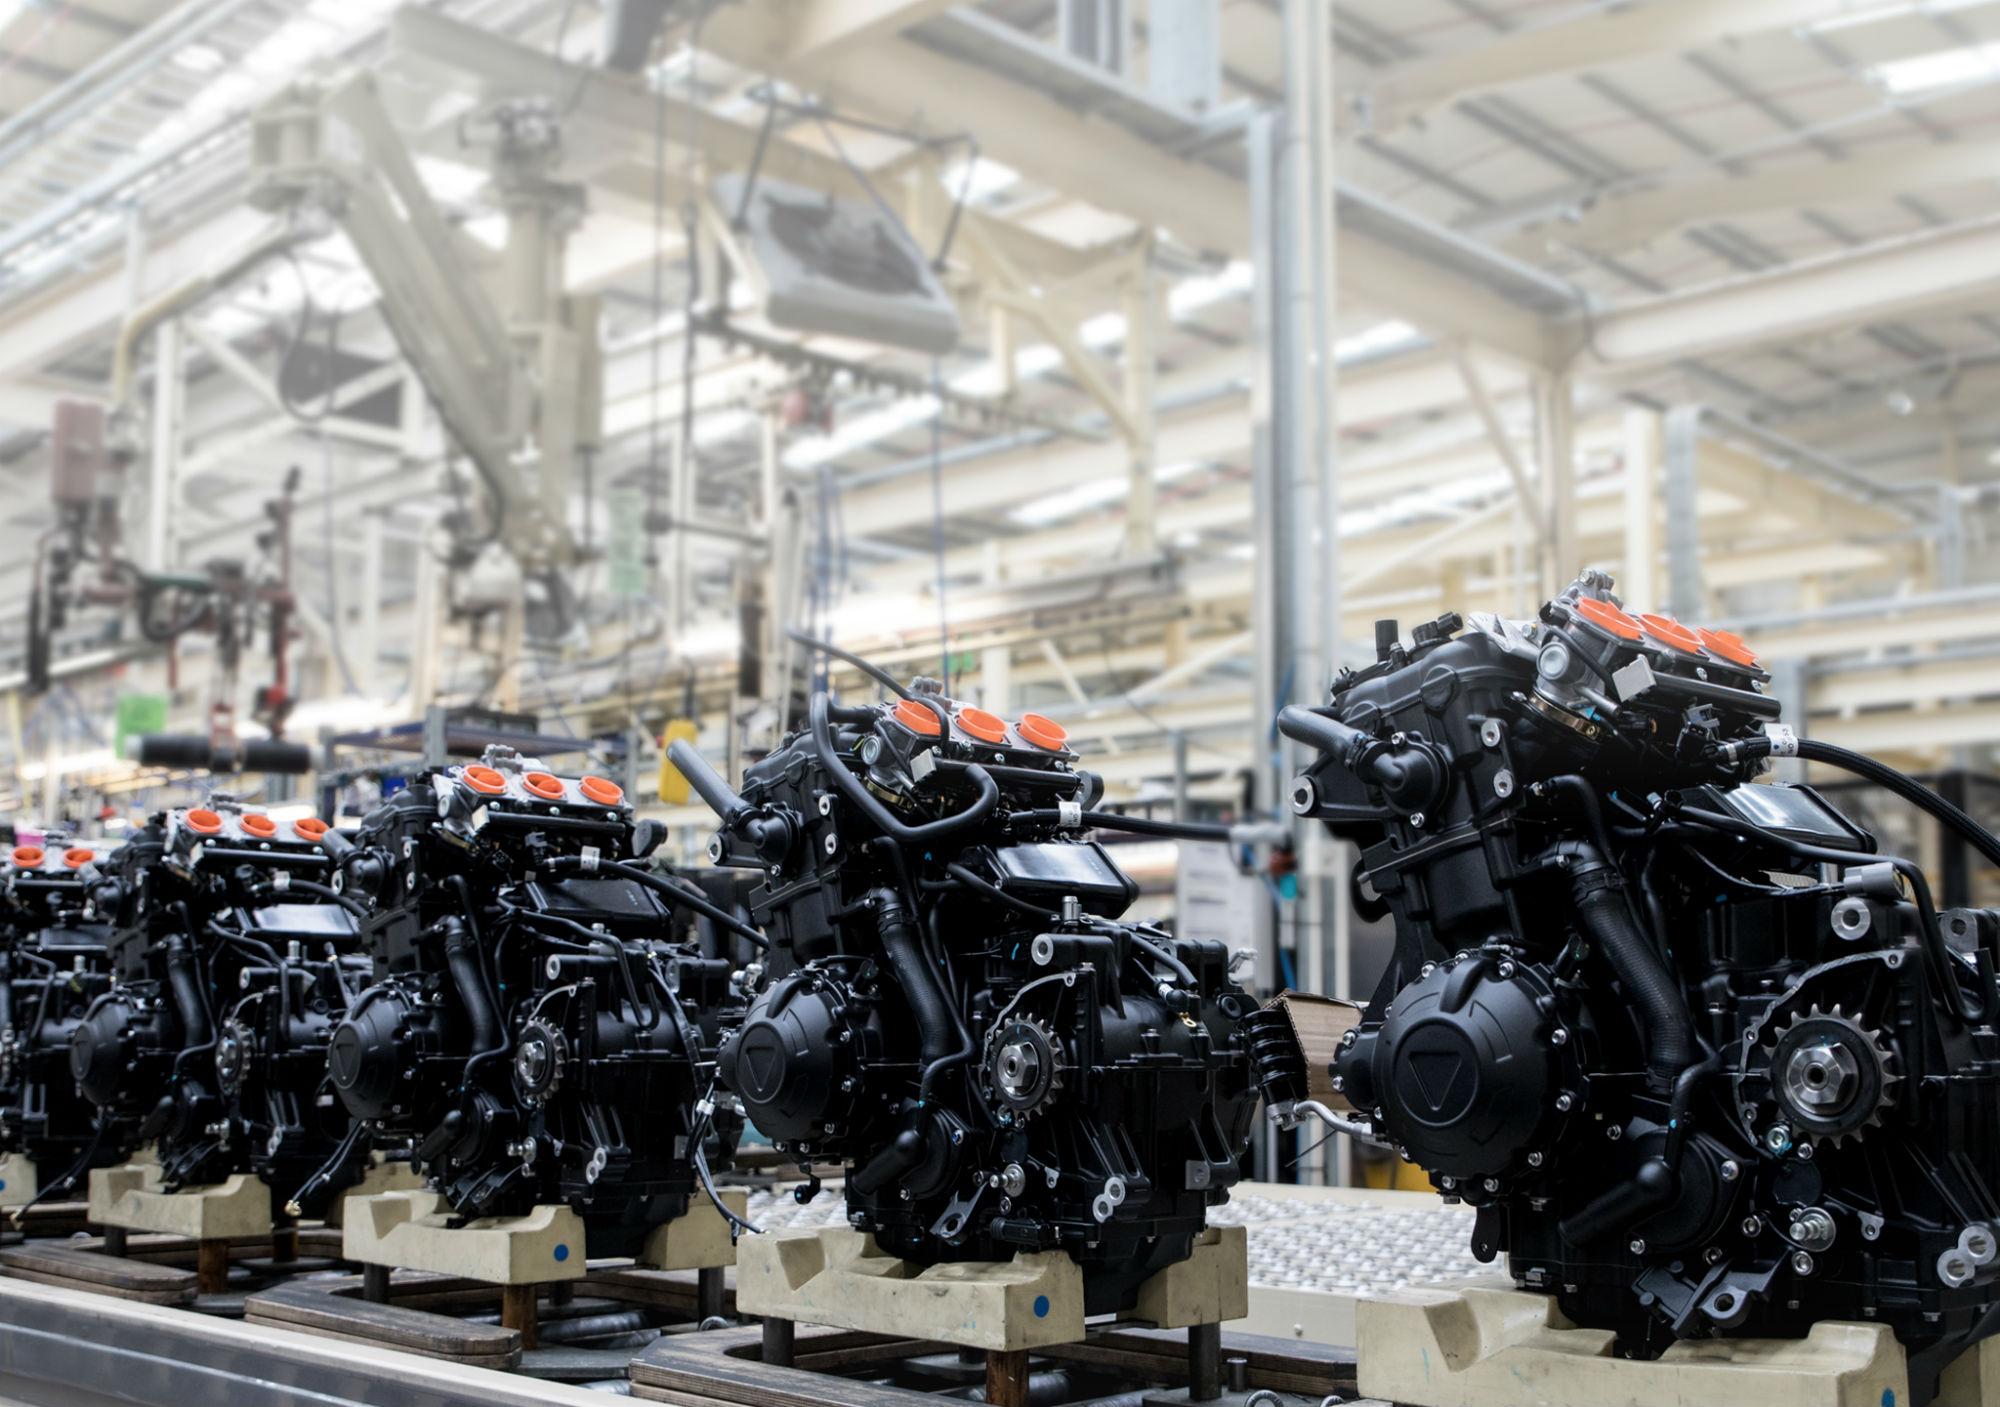 Triumph reveals new factory visitor centre